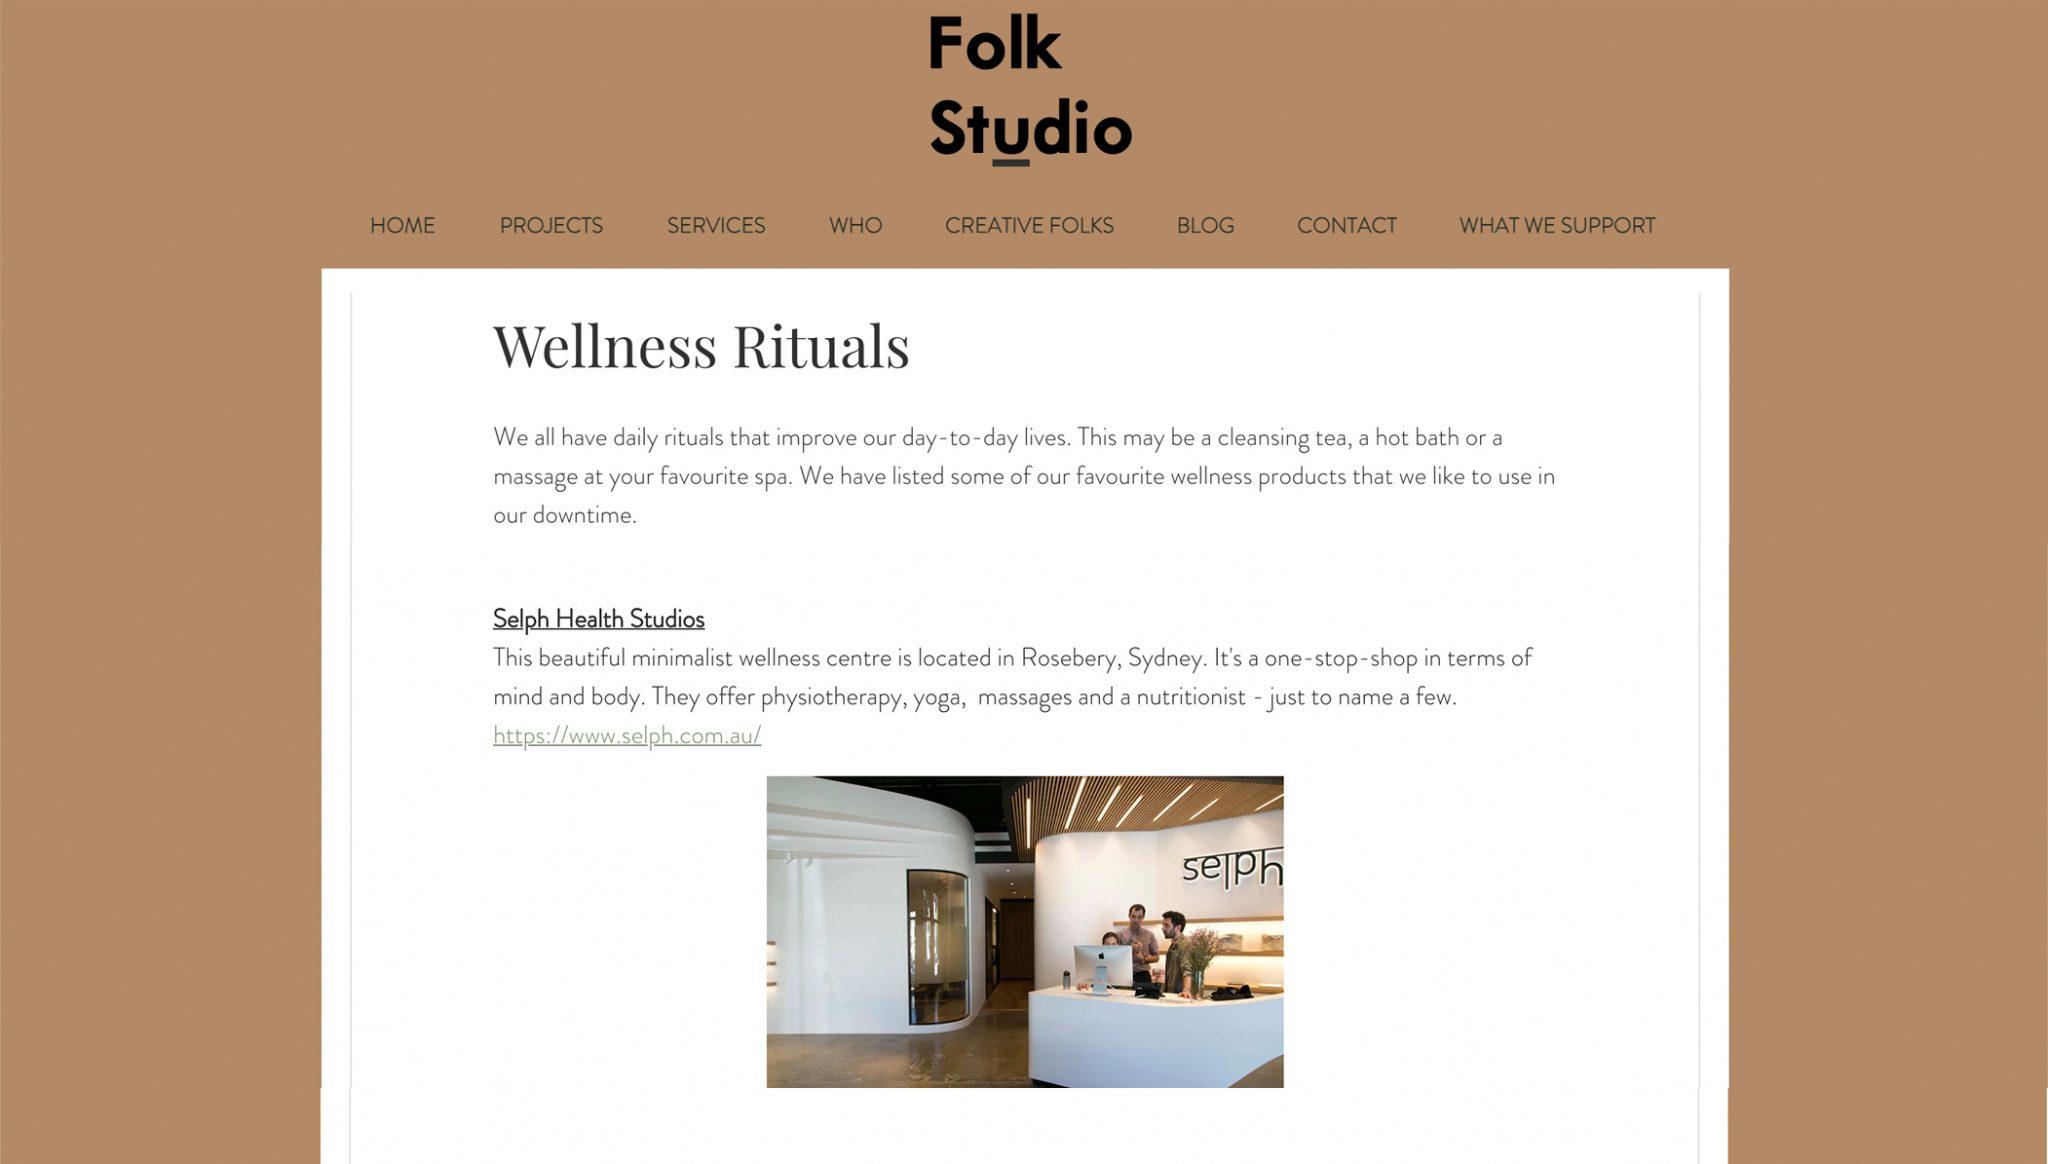 Wellness Rituals With Folk Studio & Selph Health Studios